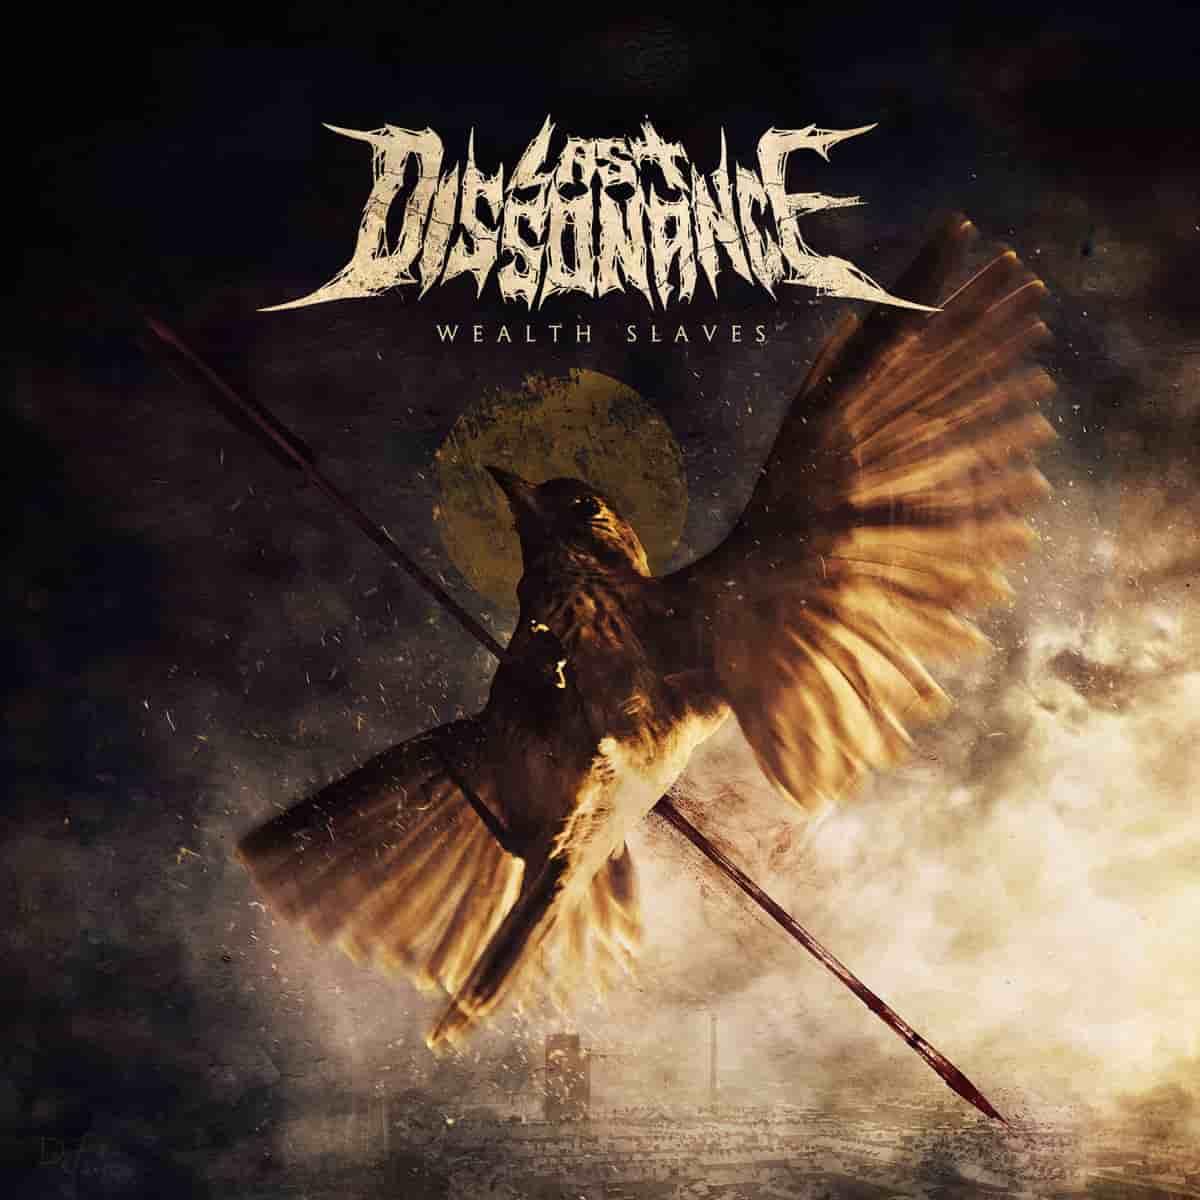 Last Dissonance - Wealth Slaves